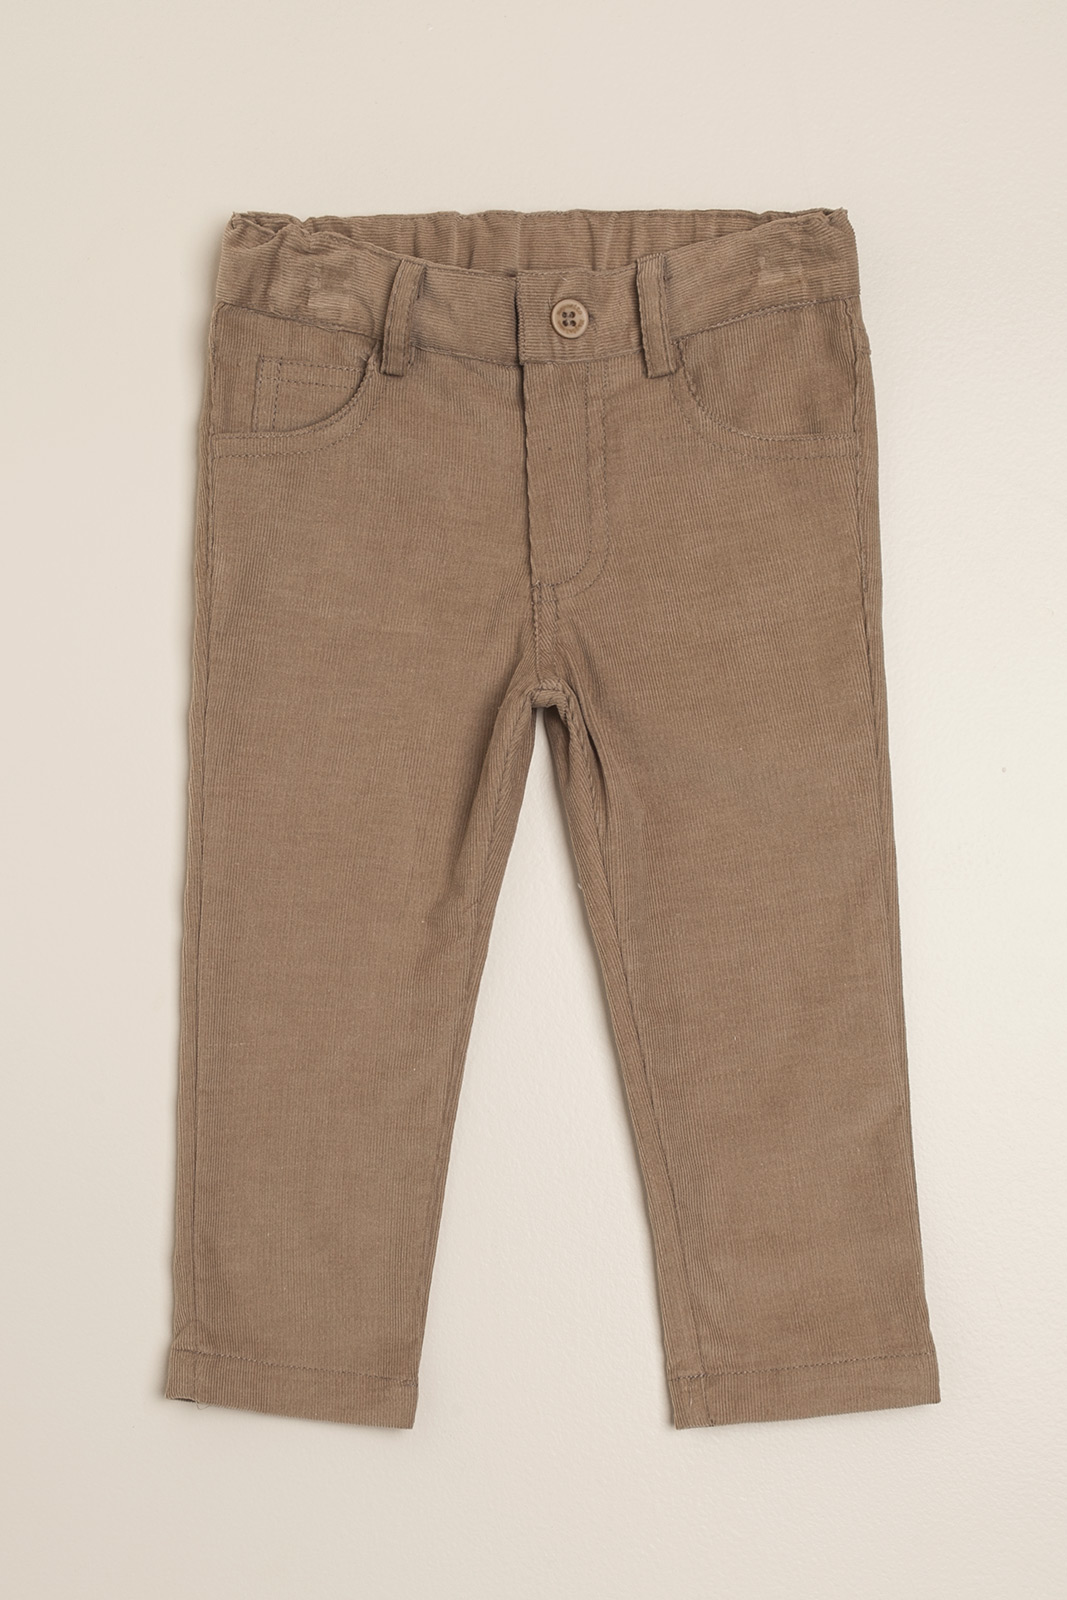 Pantalon de corderoy beige